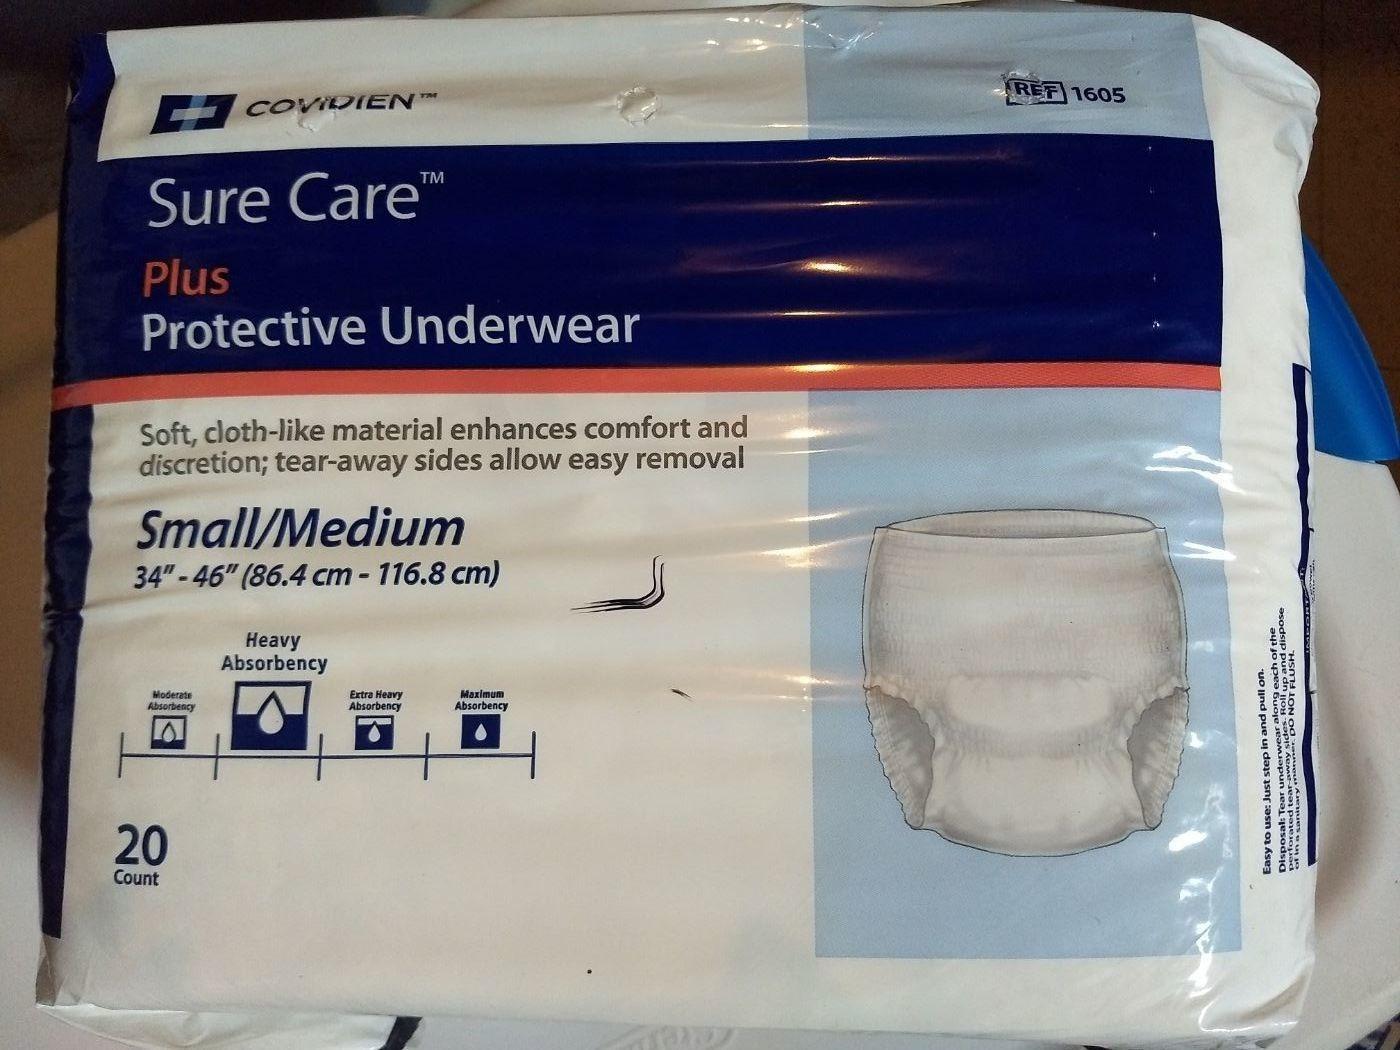 Sure Care Protective Underwear S-M